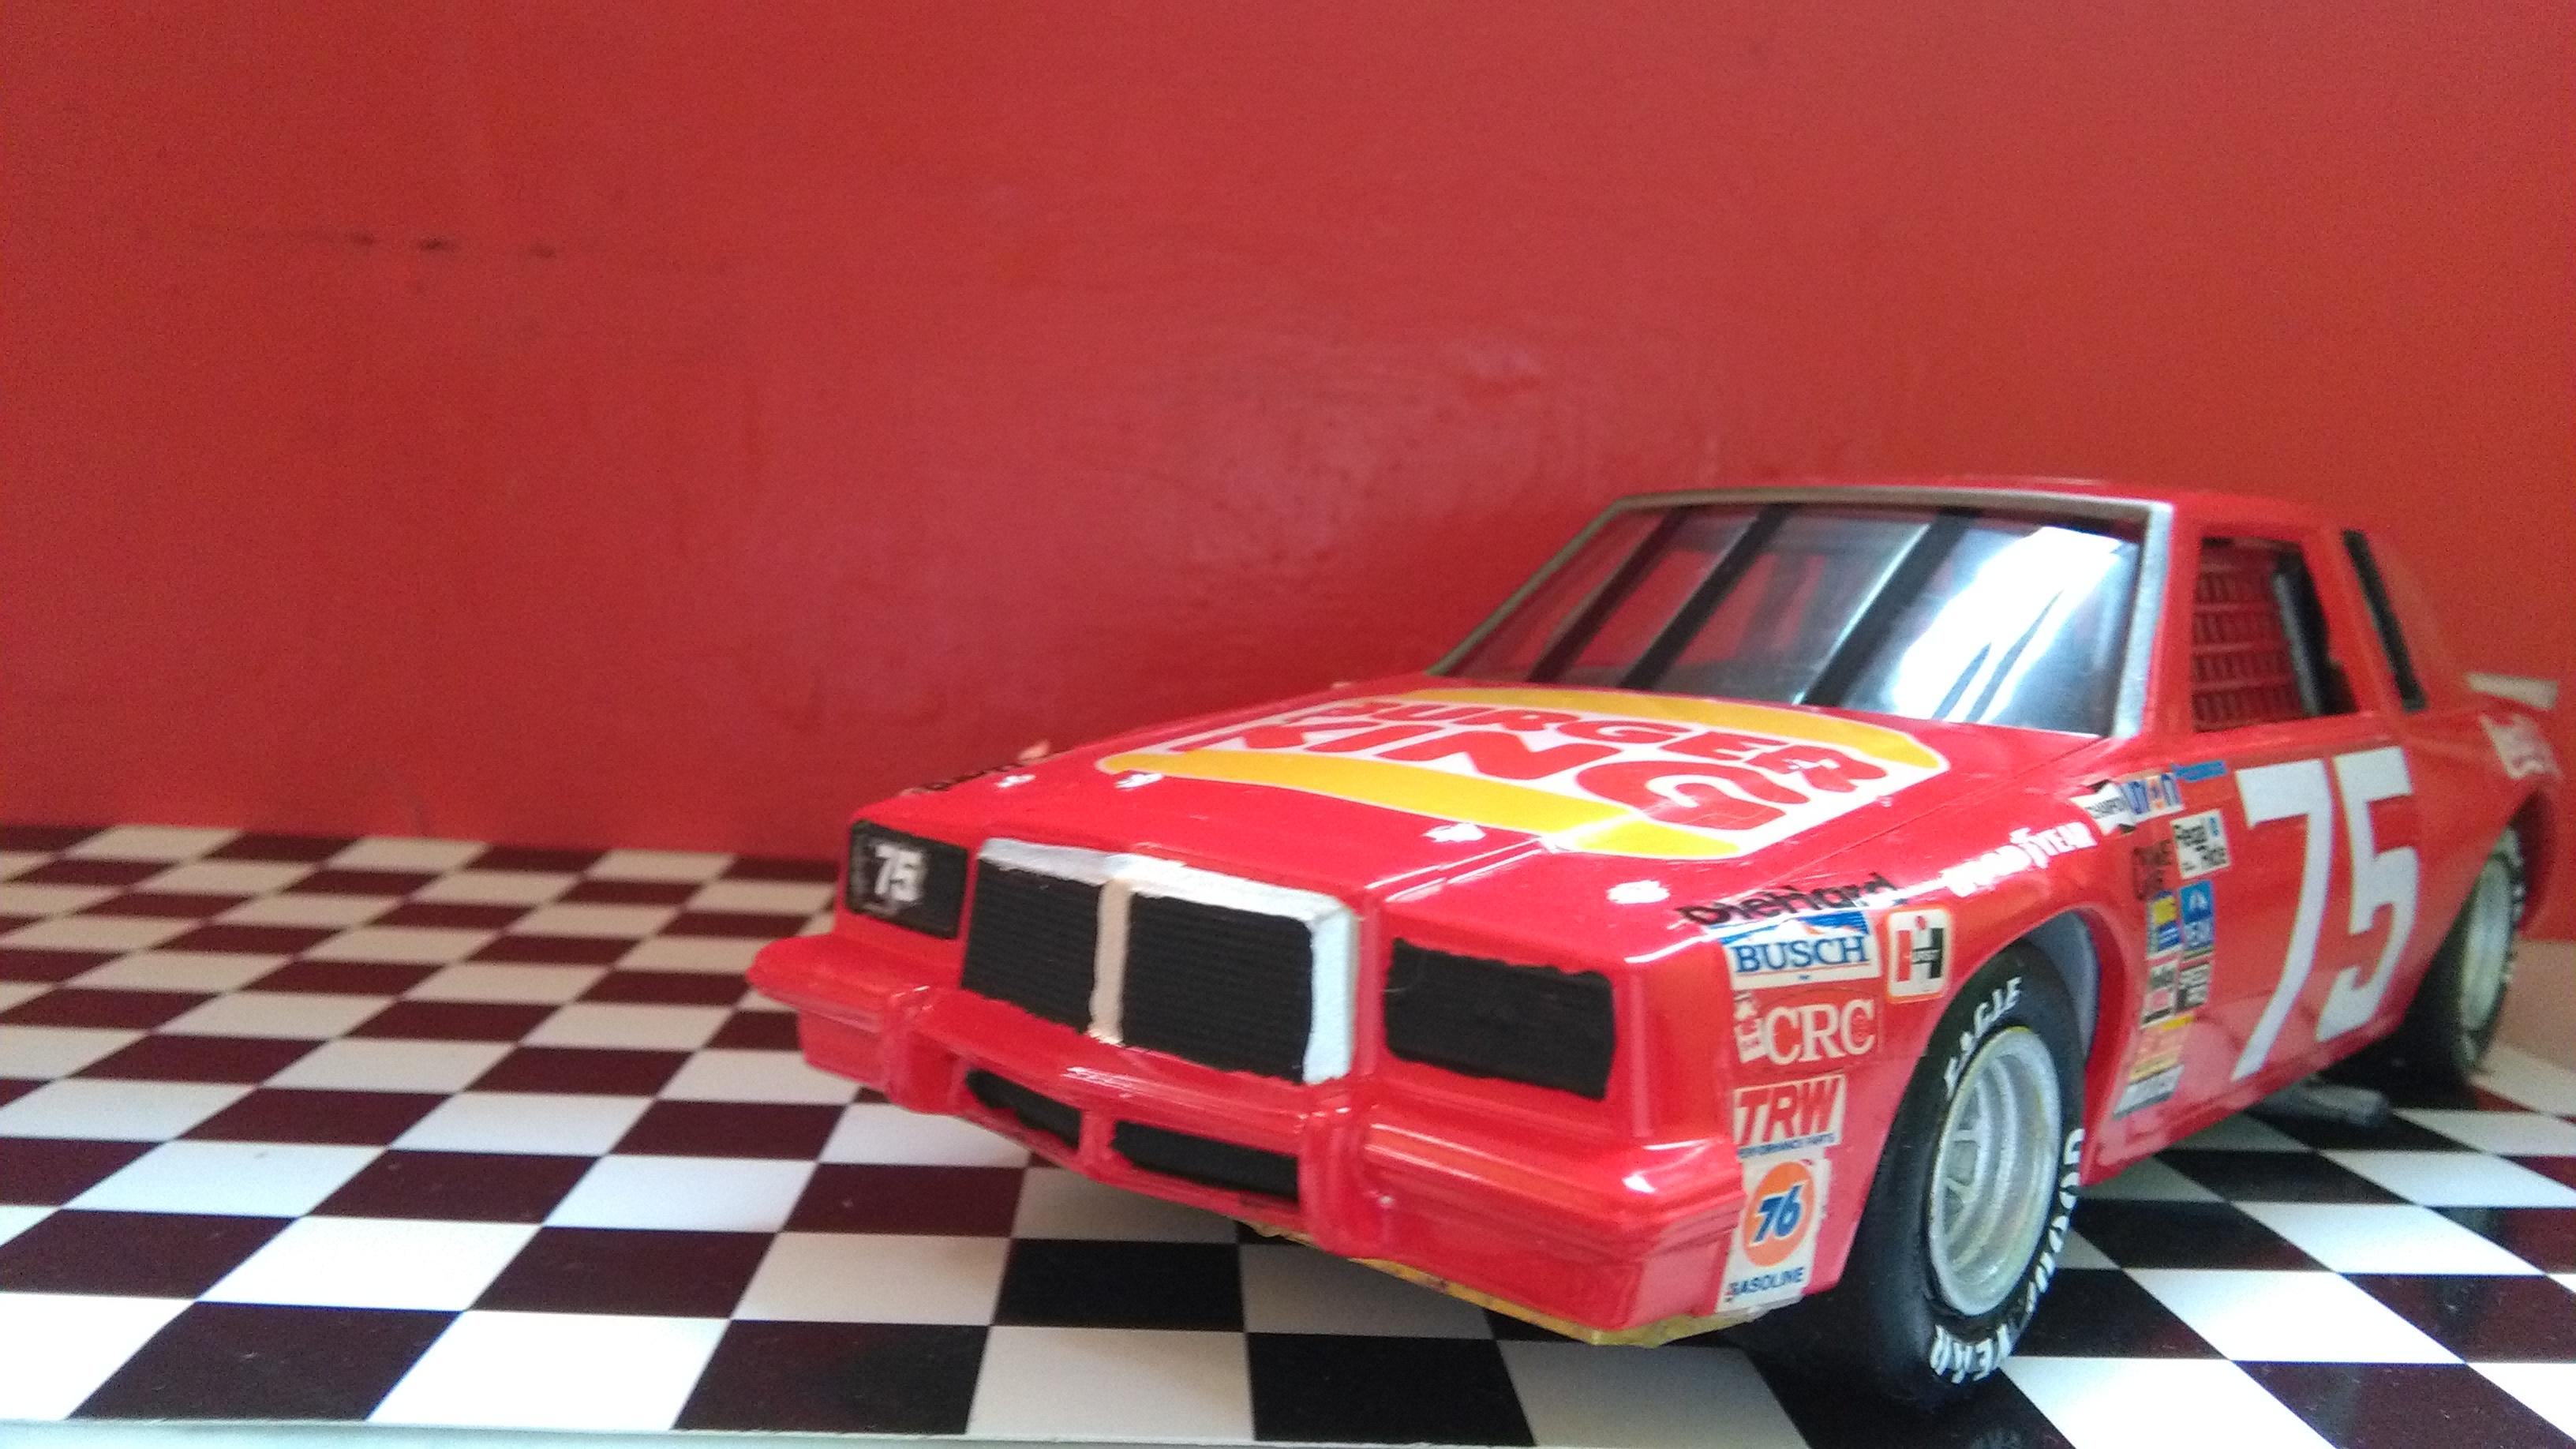 Pontiac Grand-Prix 1985 #75 Dave Marcis Coca-Cola (AMT 1/25) 853289IMG20170506154111